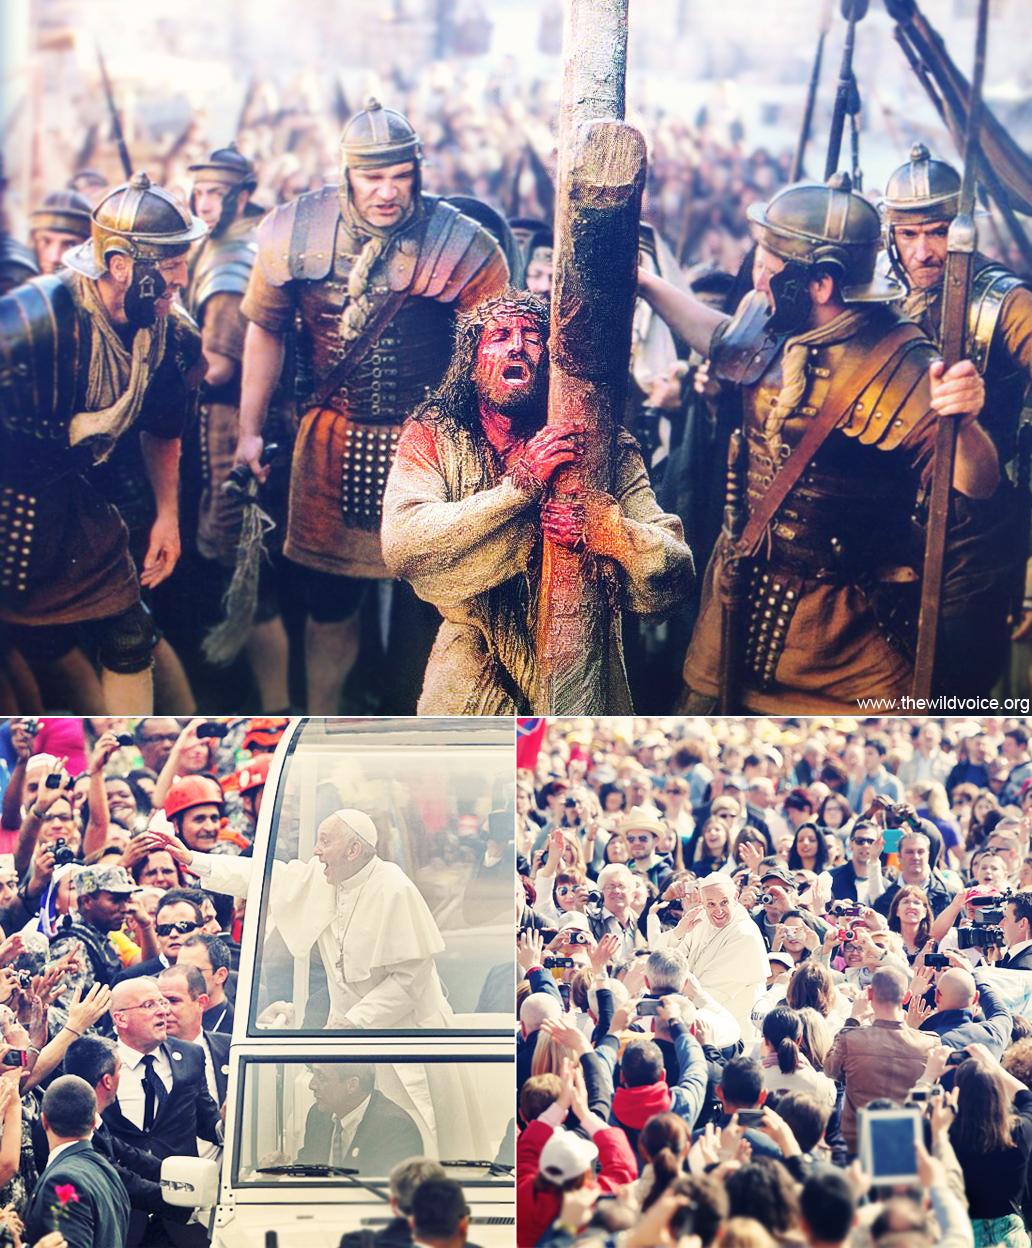 Jesus, Christ, Passion, False, Prophet, Pope, Francis, Jorge Mario Bergoglio, The Wild Voice, Maria Divine Mercy, God, Catholic, Church, schism, satan